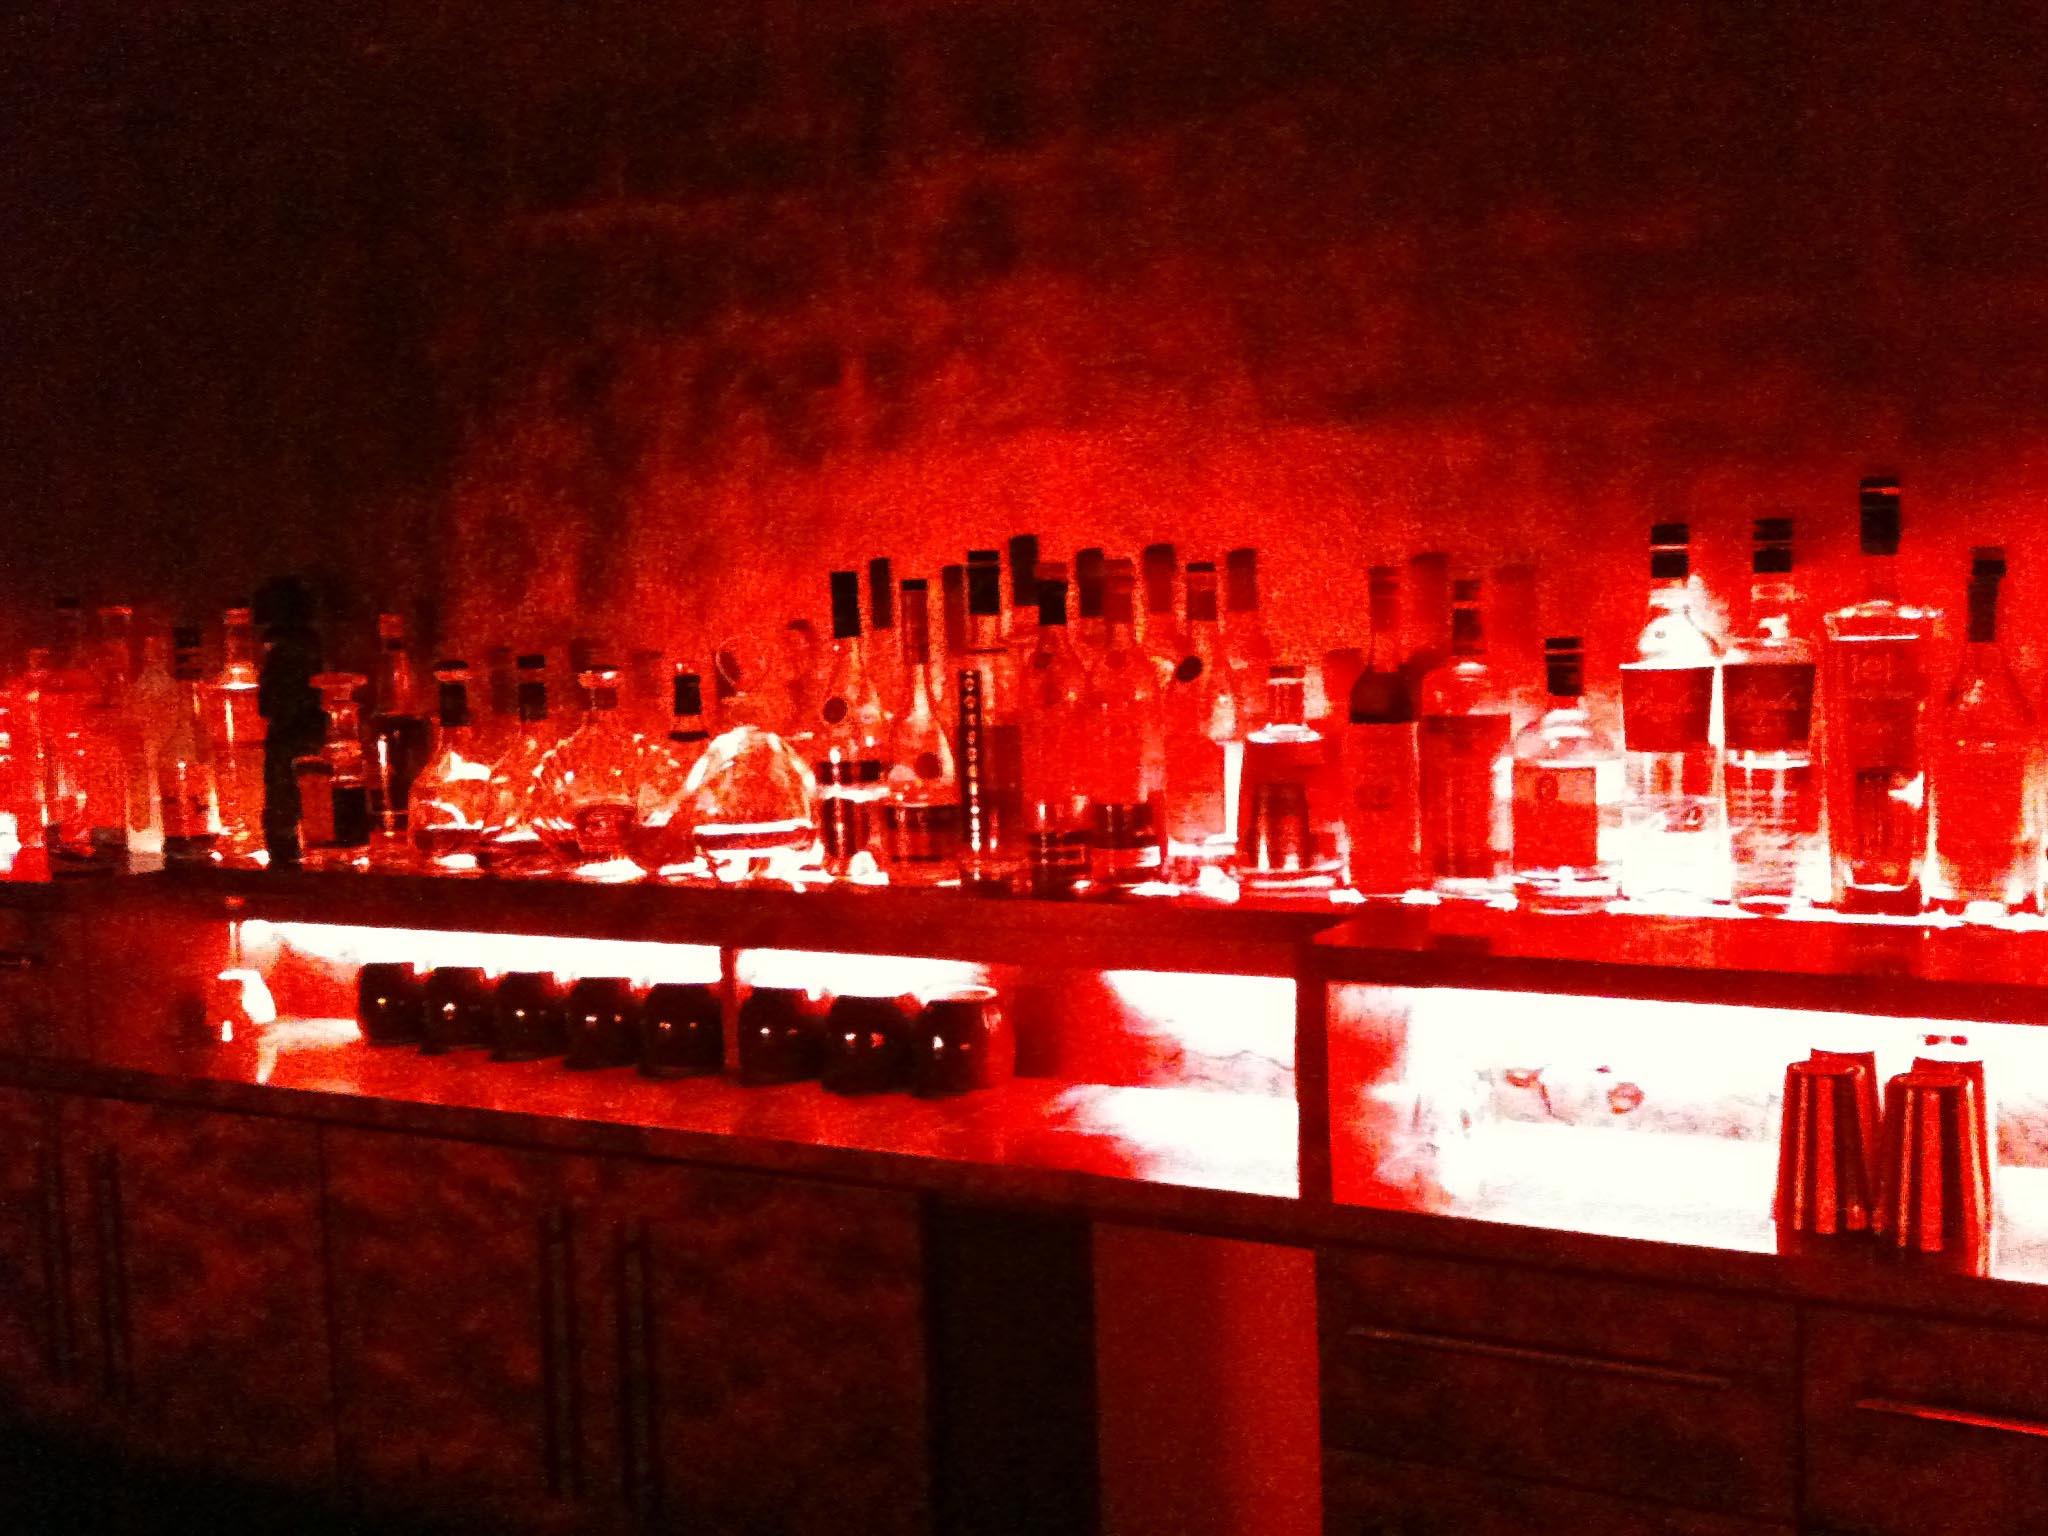 Spirit Bottles at Reingold a cocktail bar in Berlin